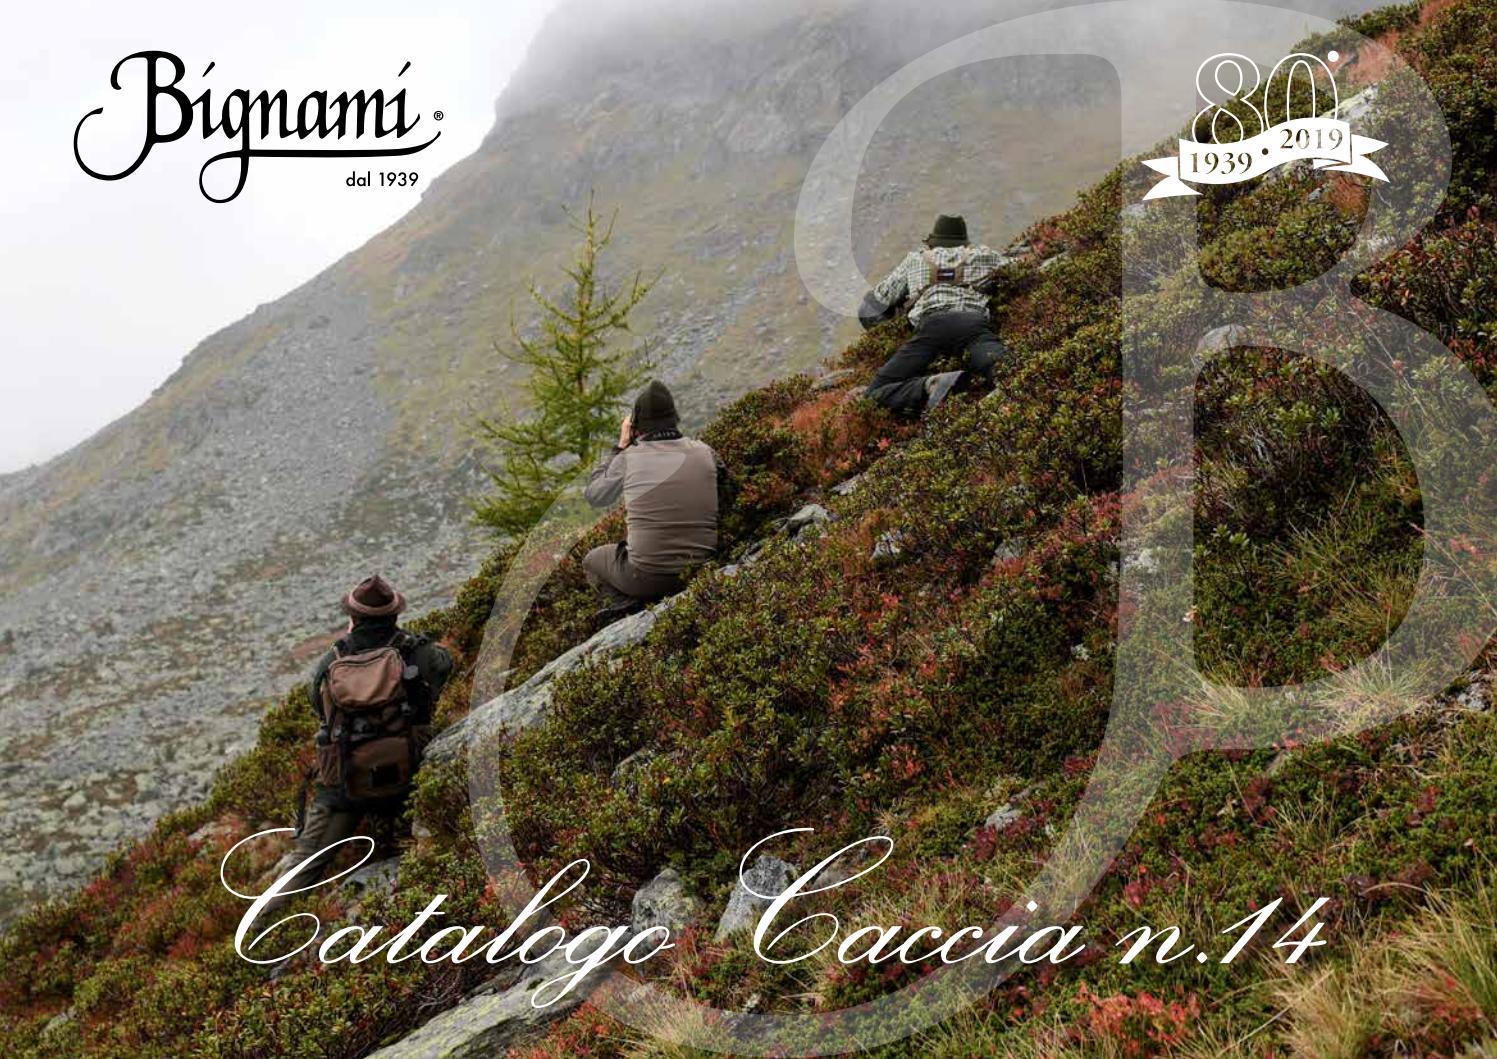 competitive price 6b0ba 7bc59 Catalogocaccia nr14 2019 web by Bignami S.p.A. - issuu